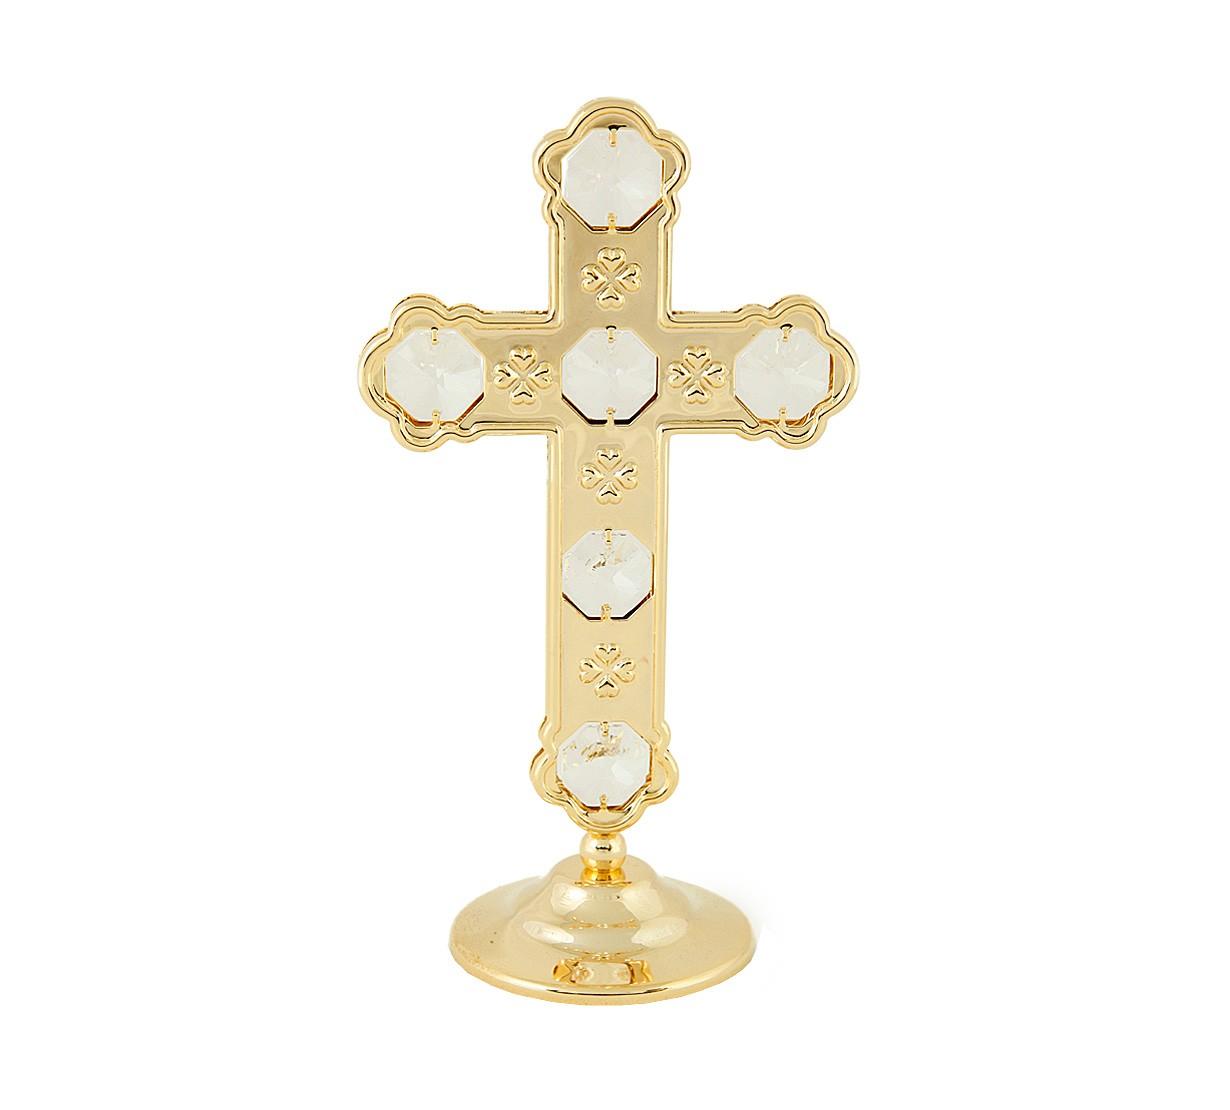 Cruce cu Cristale Swarovski - placata cu Aur 24 k - marime mare